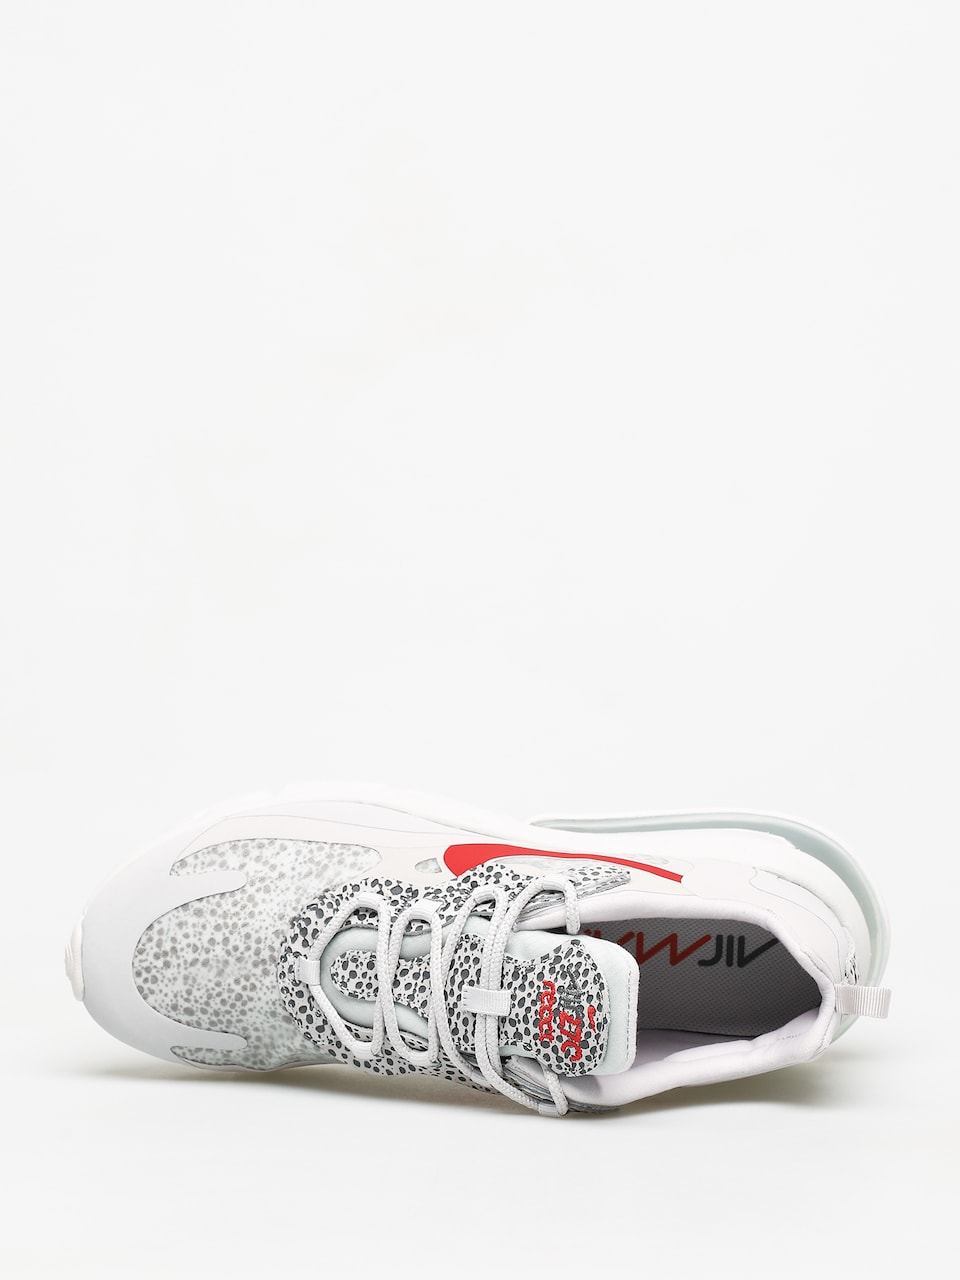 Buty Nike Air Max 270 React (neutral greyuniversity red lt